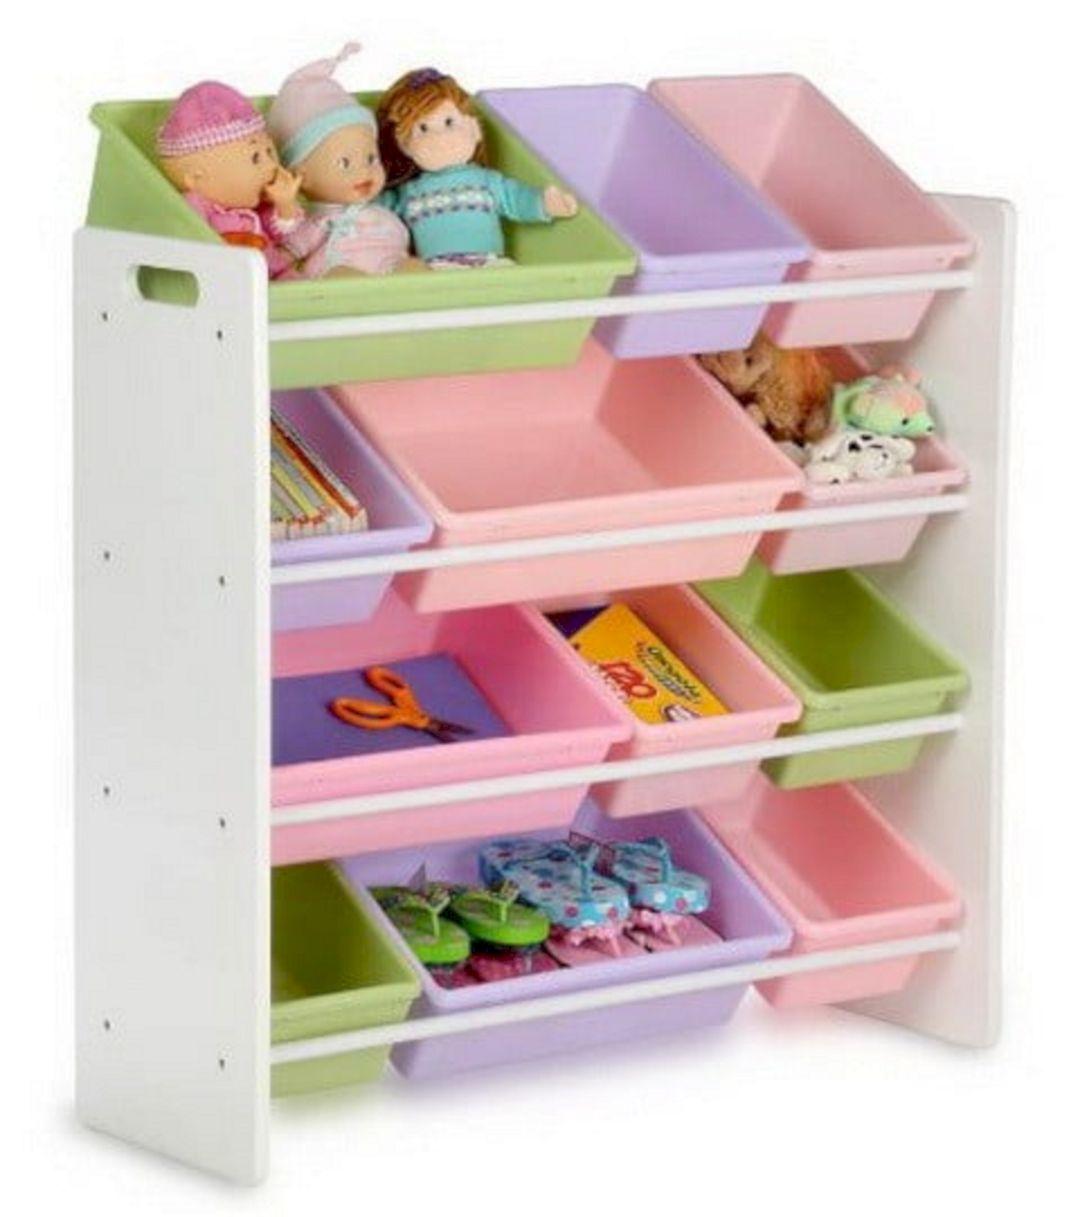 Toy Storage Organization Ideas 15